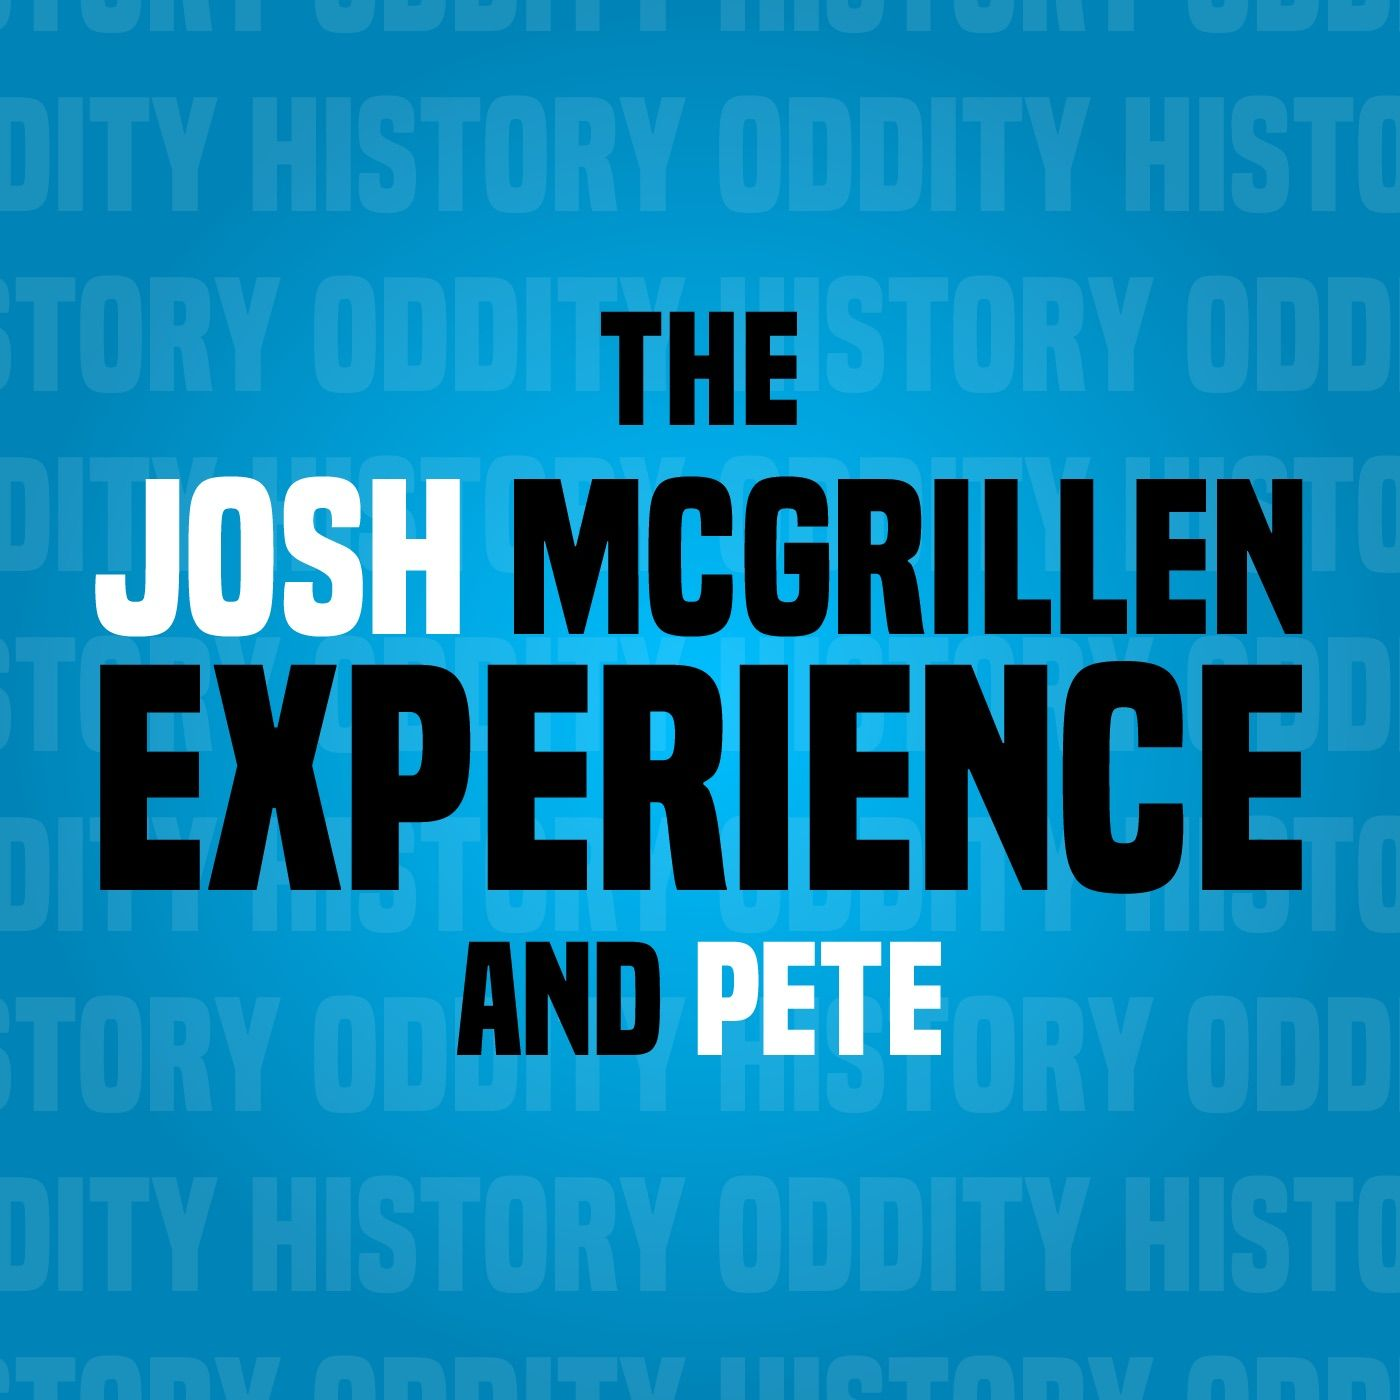 The Josh McGrillen Experience & Pete - Episode 6